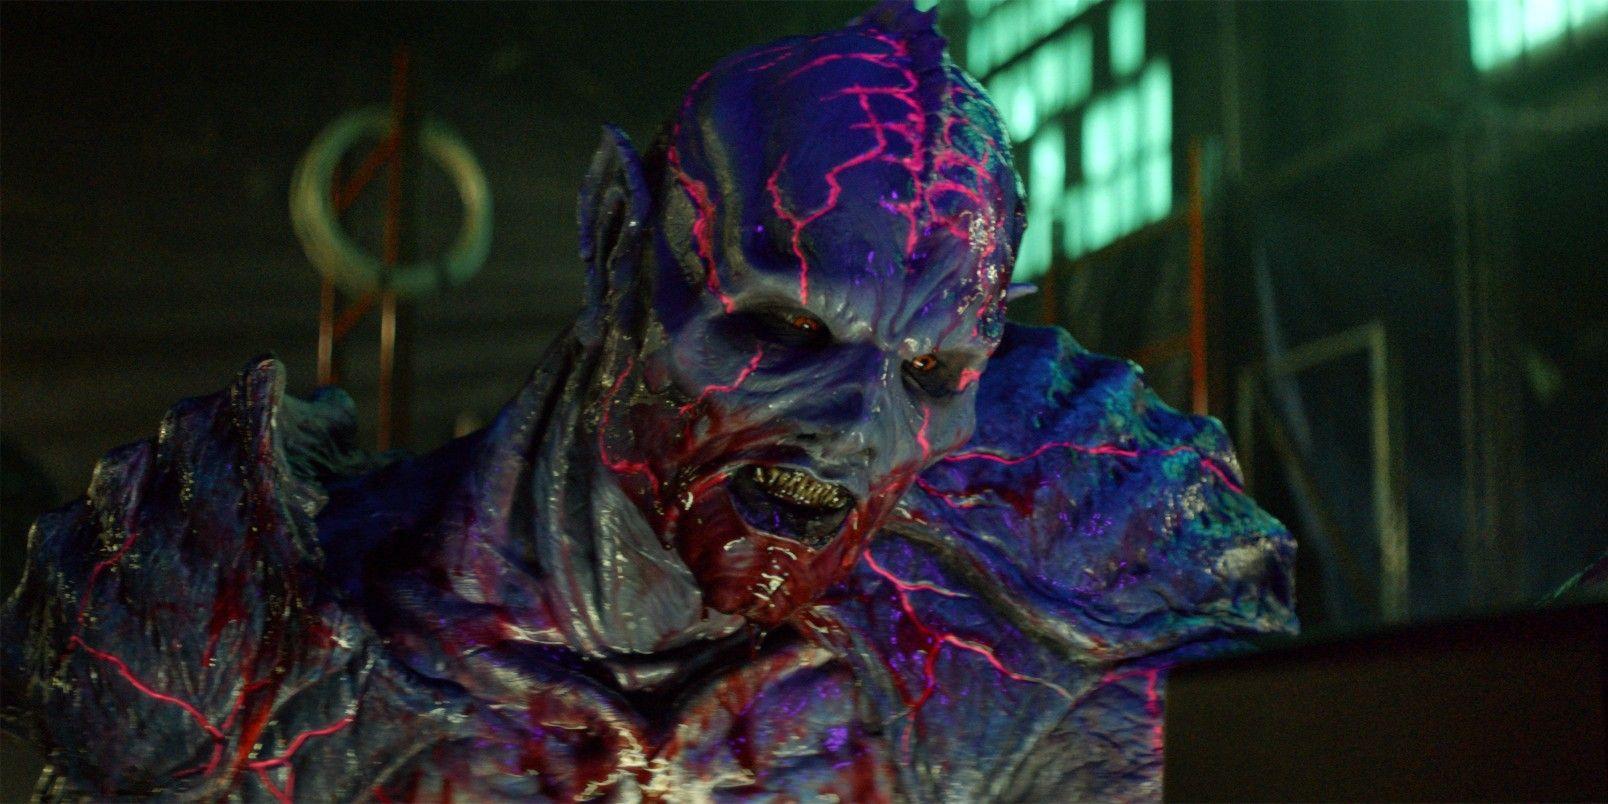 Psycho Goreman Arrives on Shudder in May | CBR